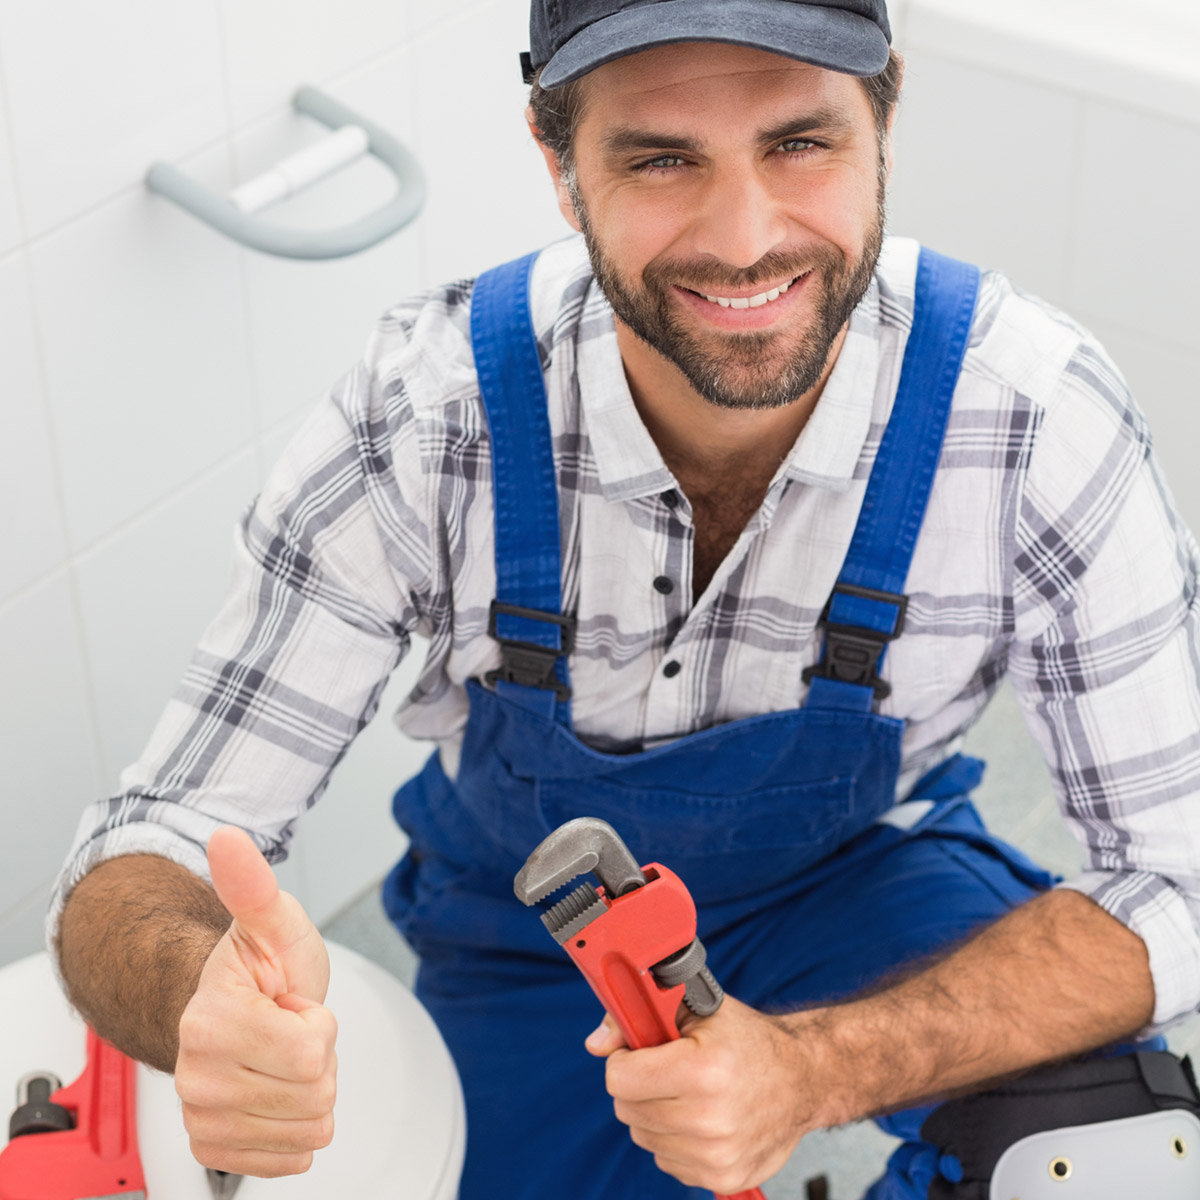 100% Plumbing, Your Plumbers on the Costa Blanca